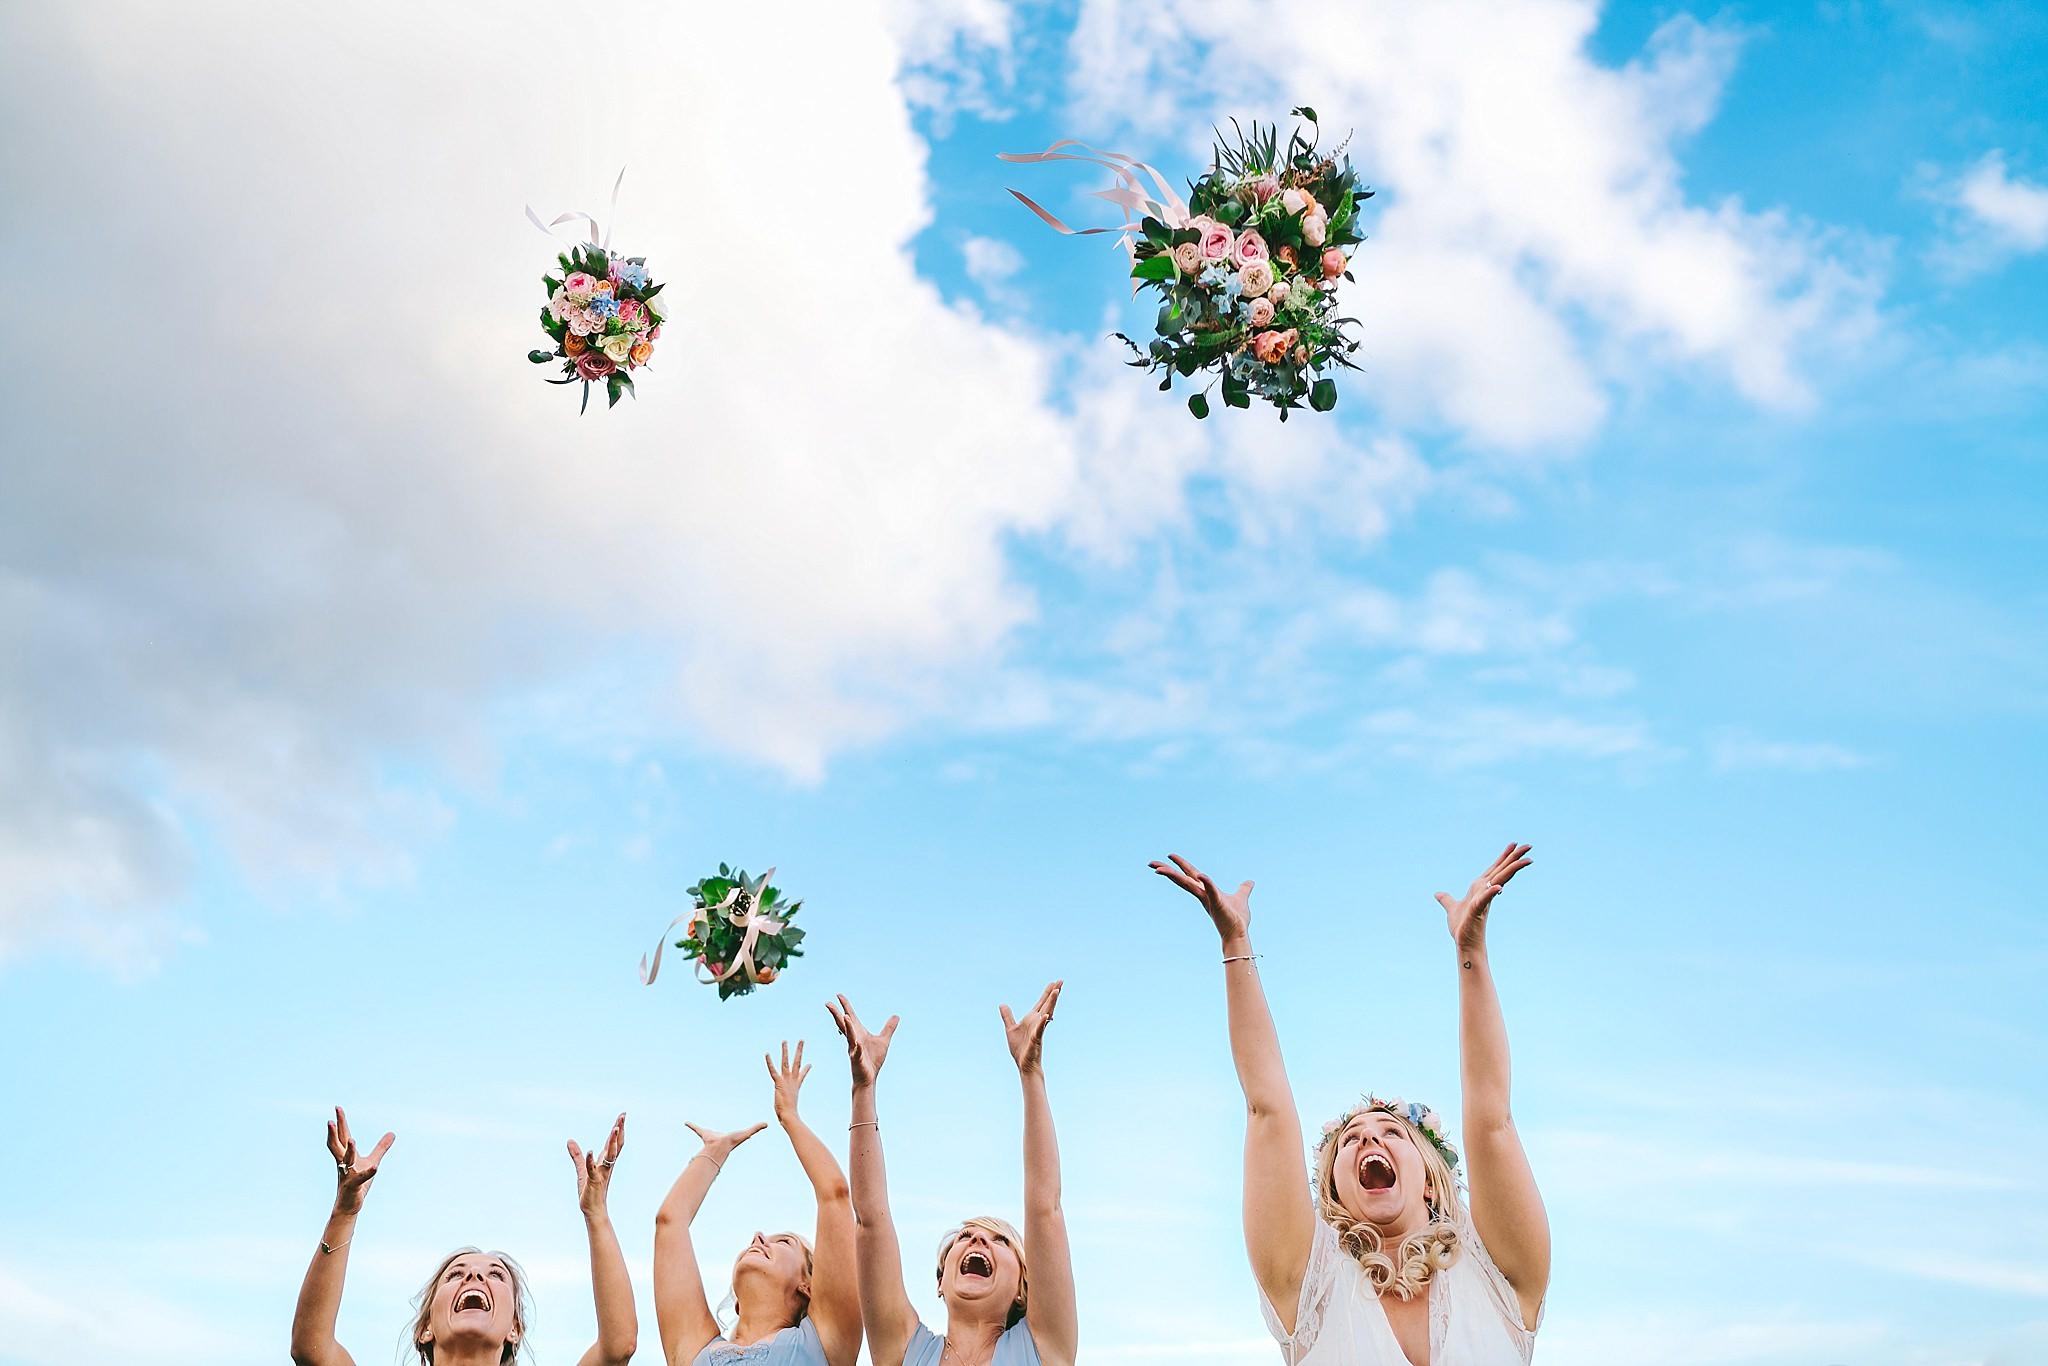 aga-tomaszek-wedding-photographer-cardiff-2016_1000